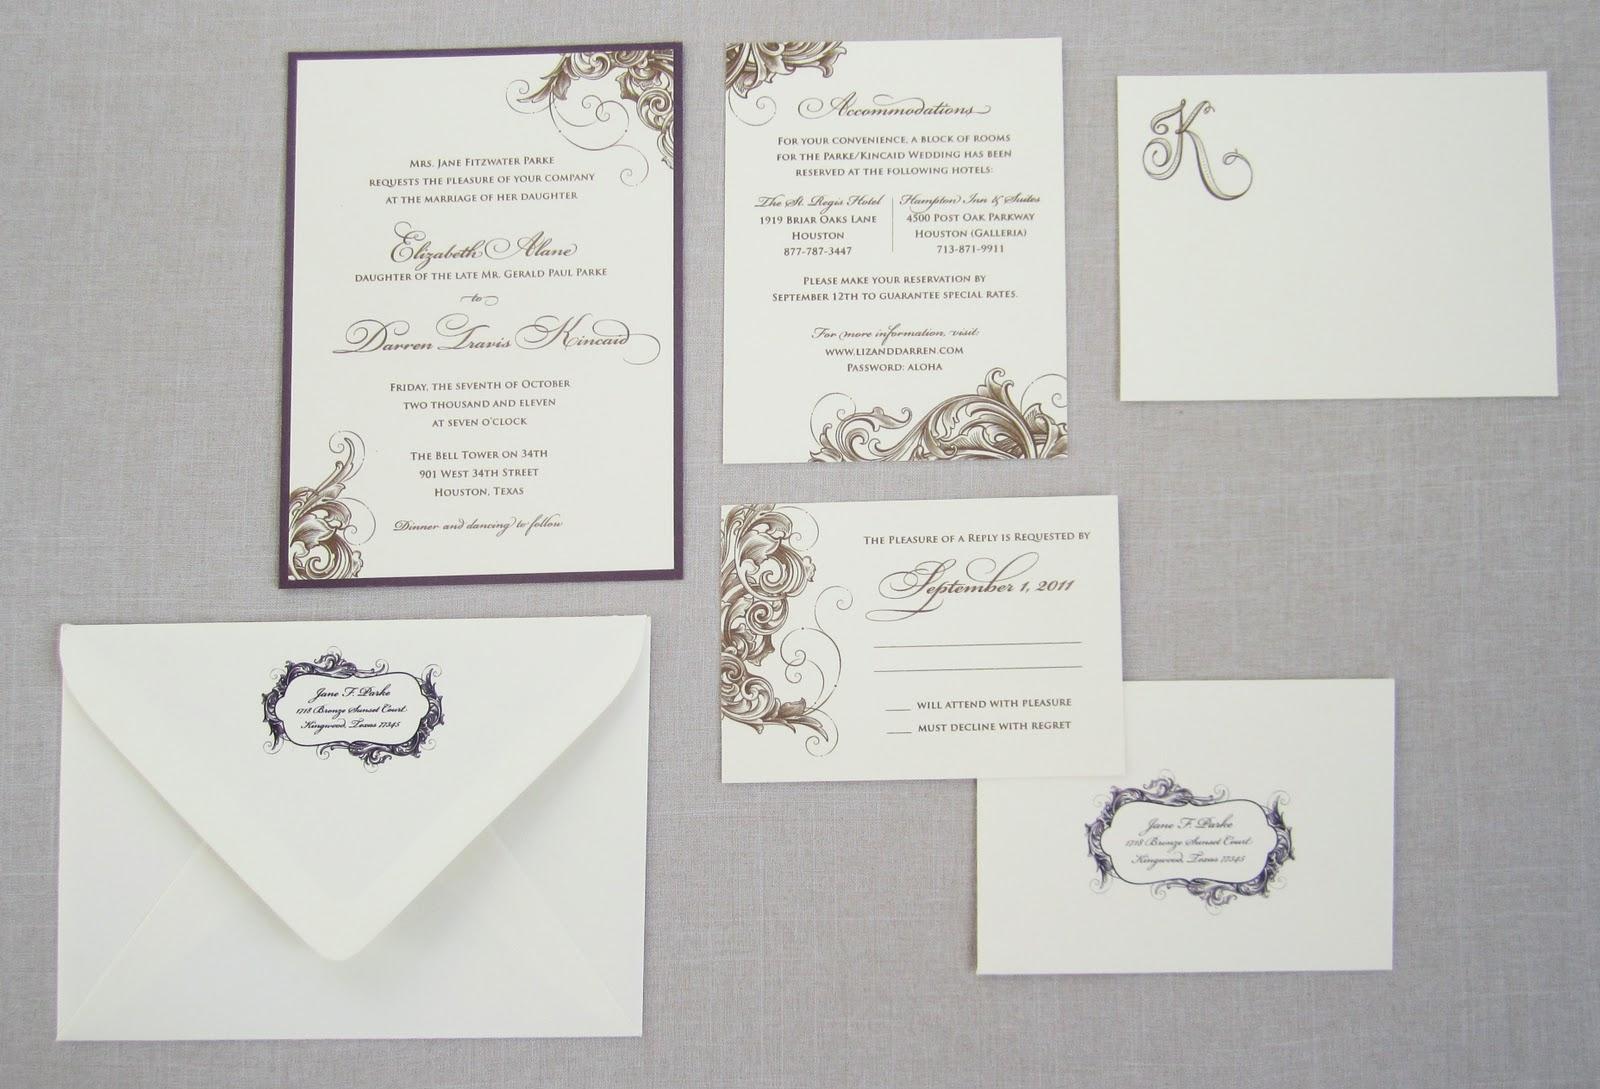 Wedding Invitation Outer Envelope: Tailored: Looking Back On New Design: Liz & Darren's